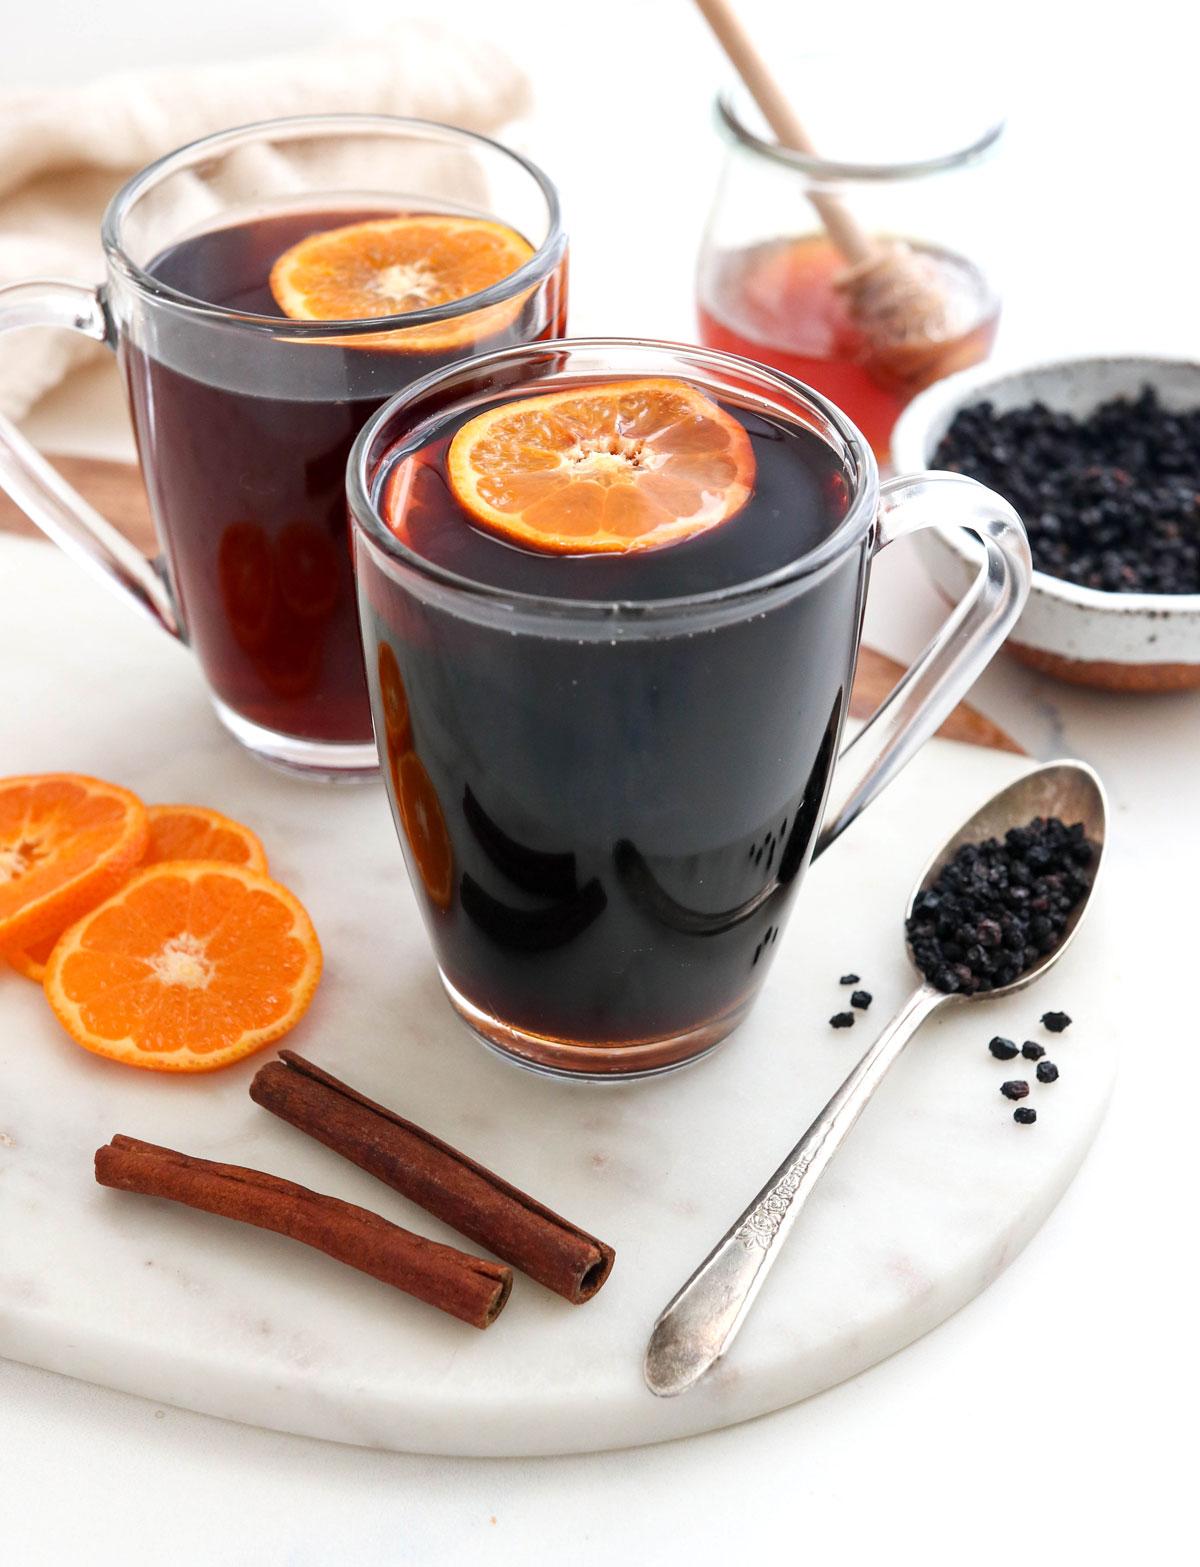 orange slices floating in elderberry tea